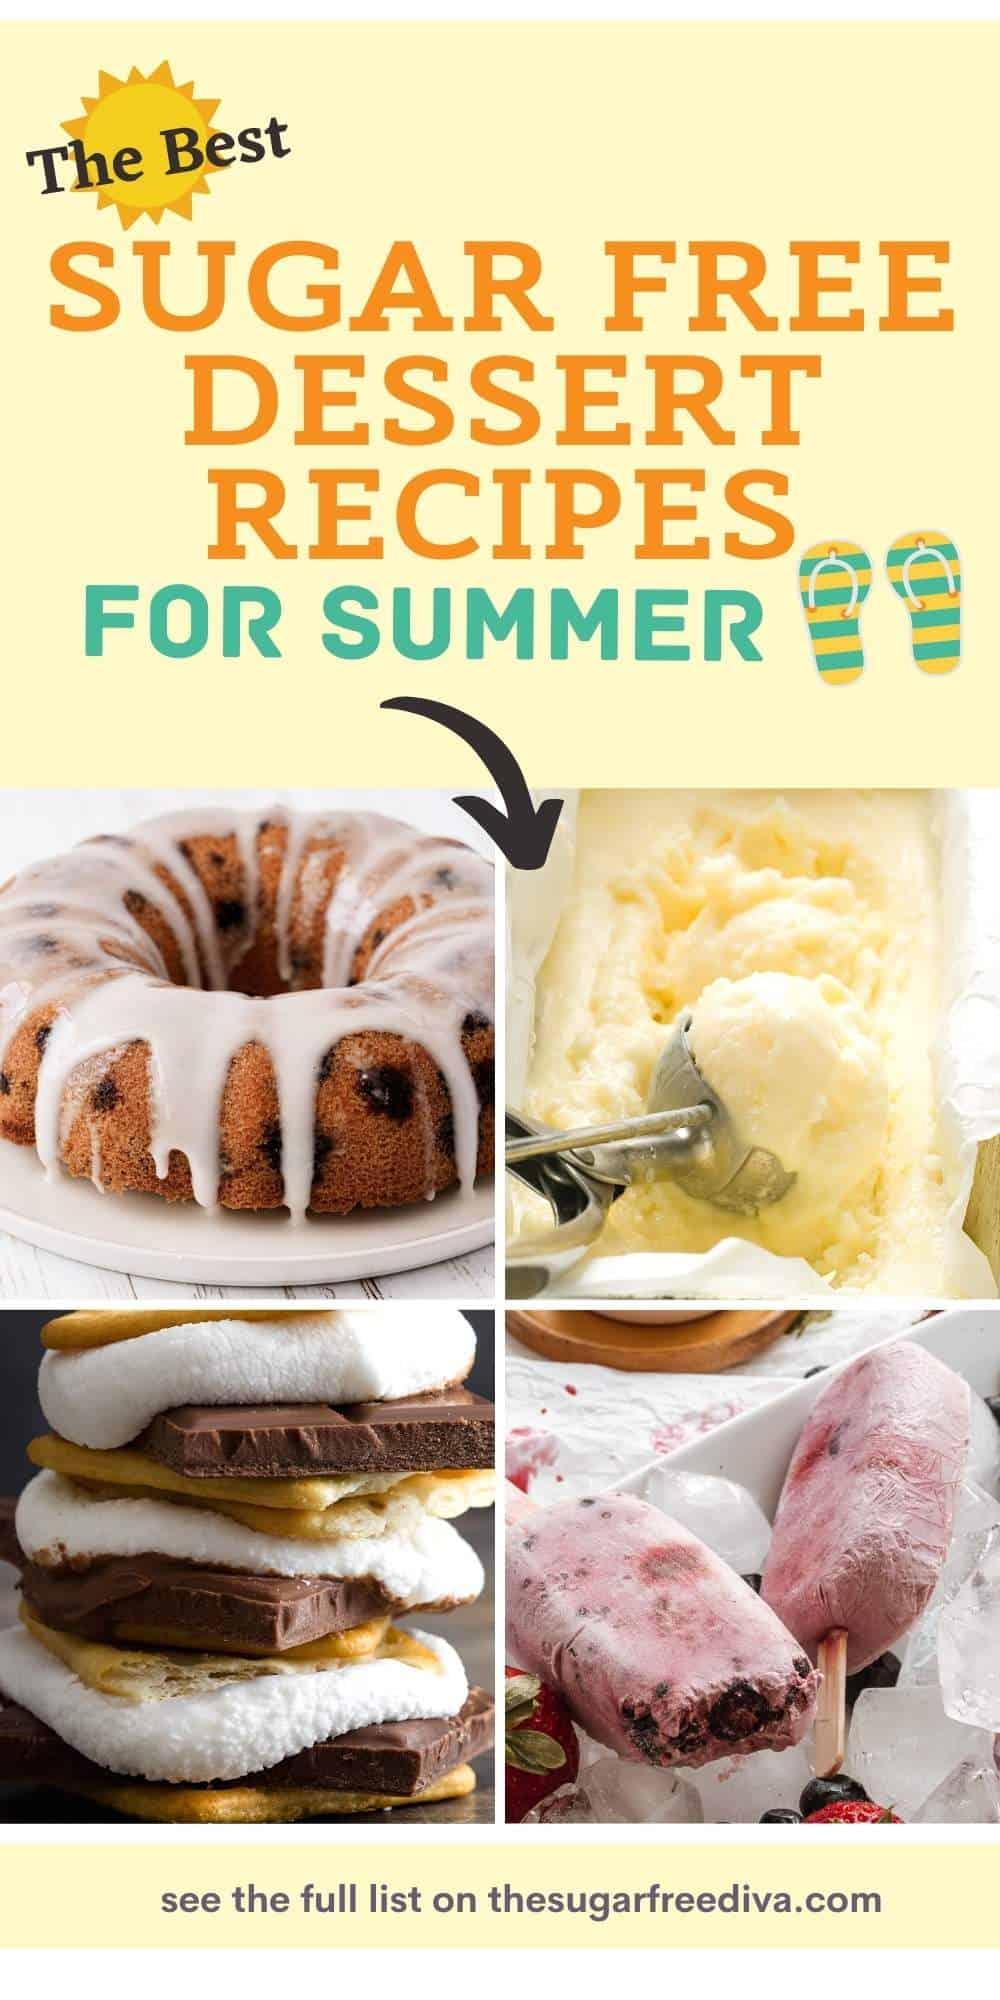 Sugar Free Dessert Recipes (1)